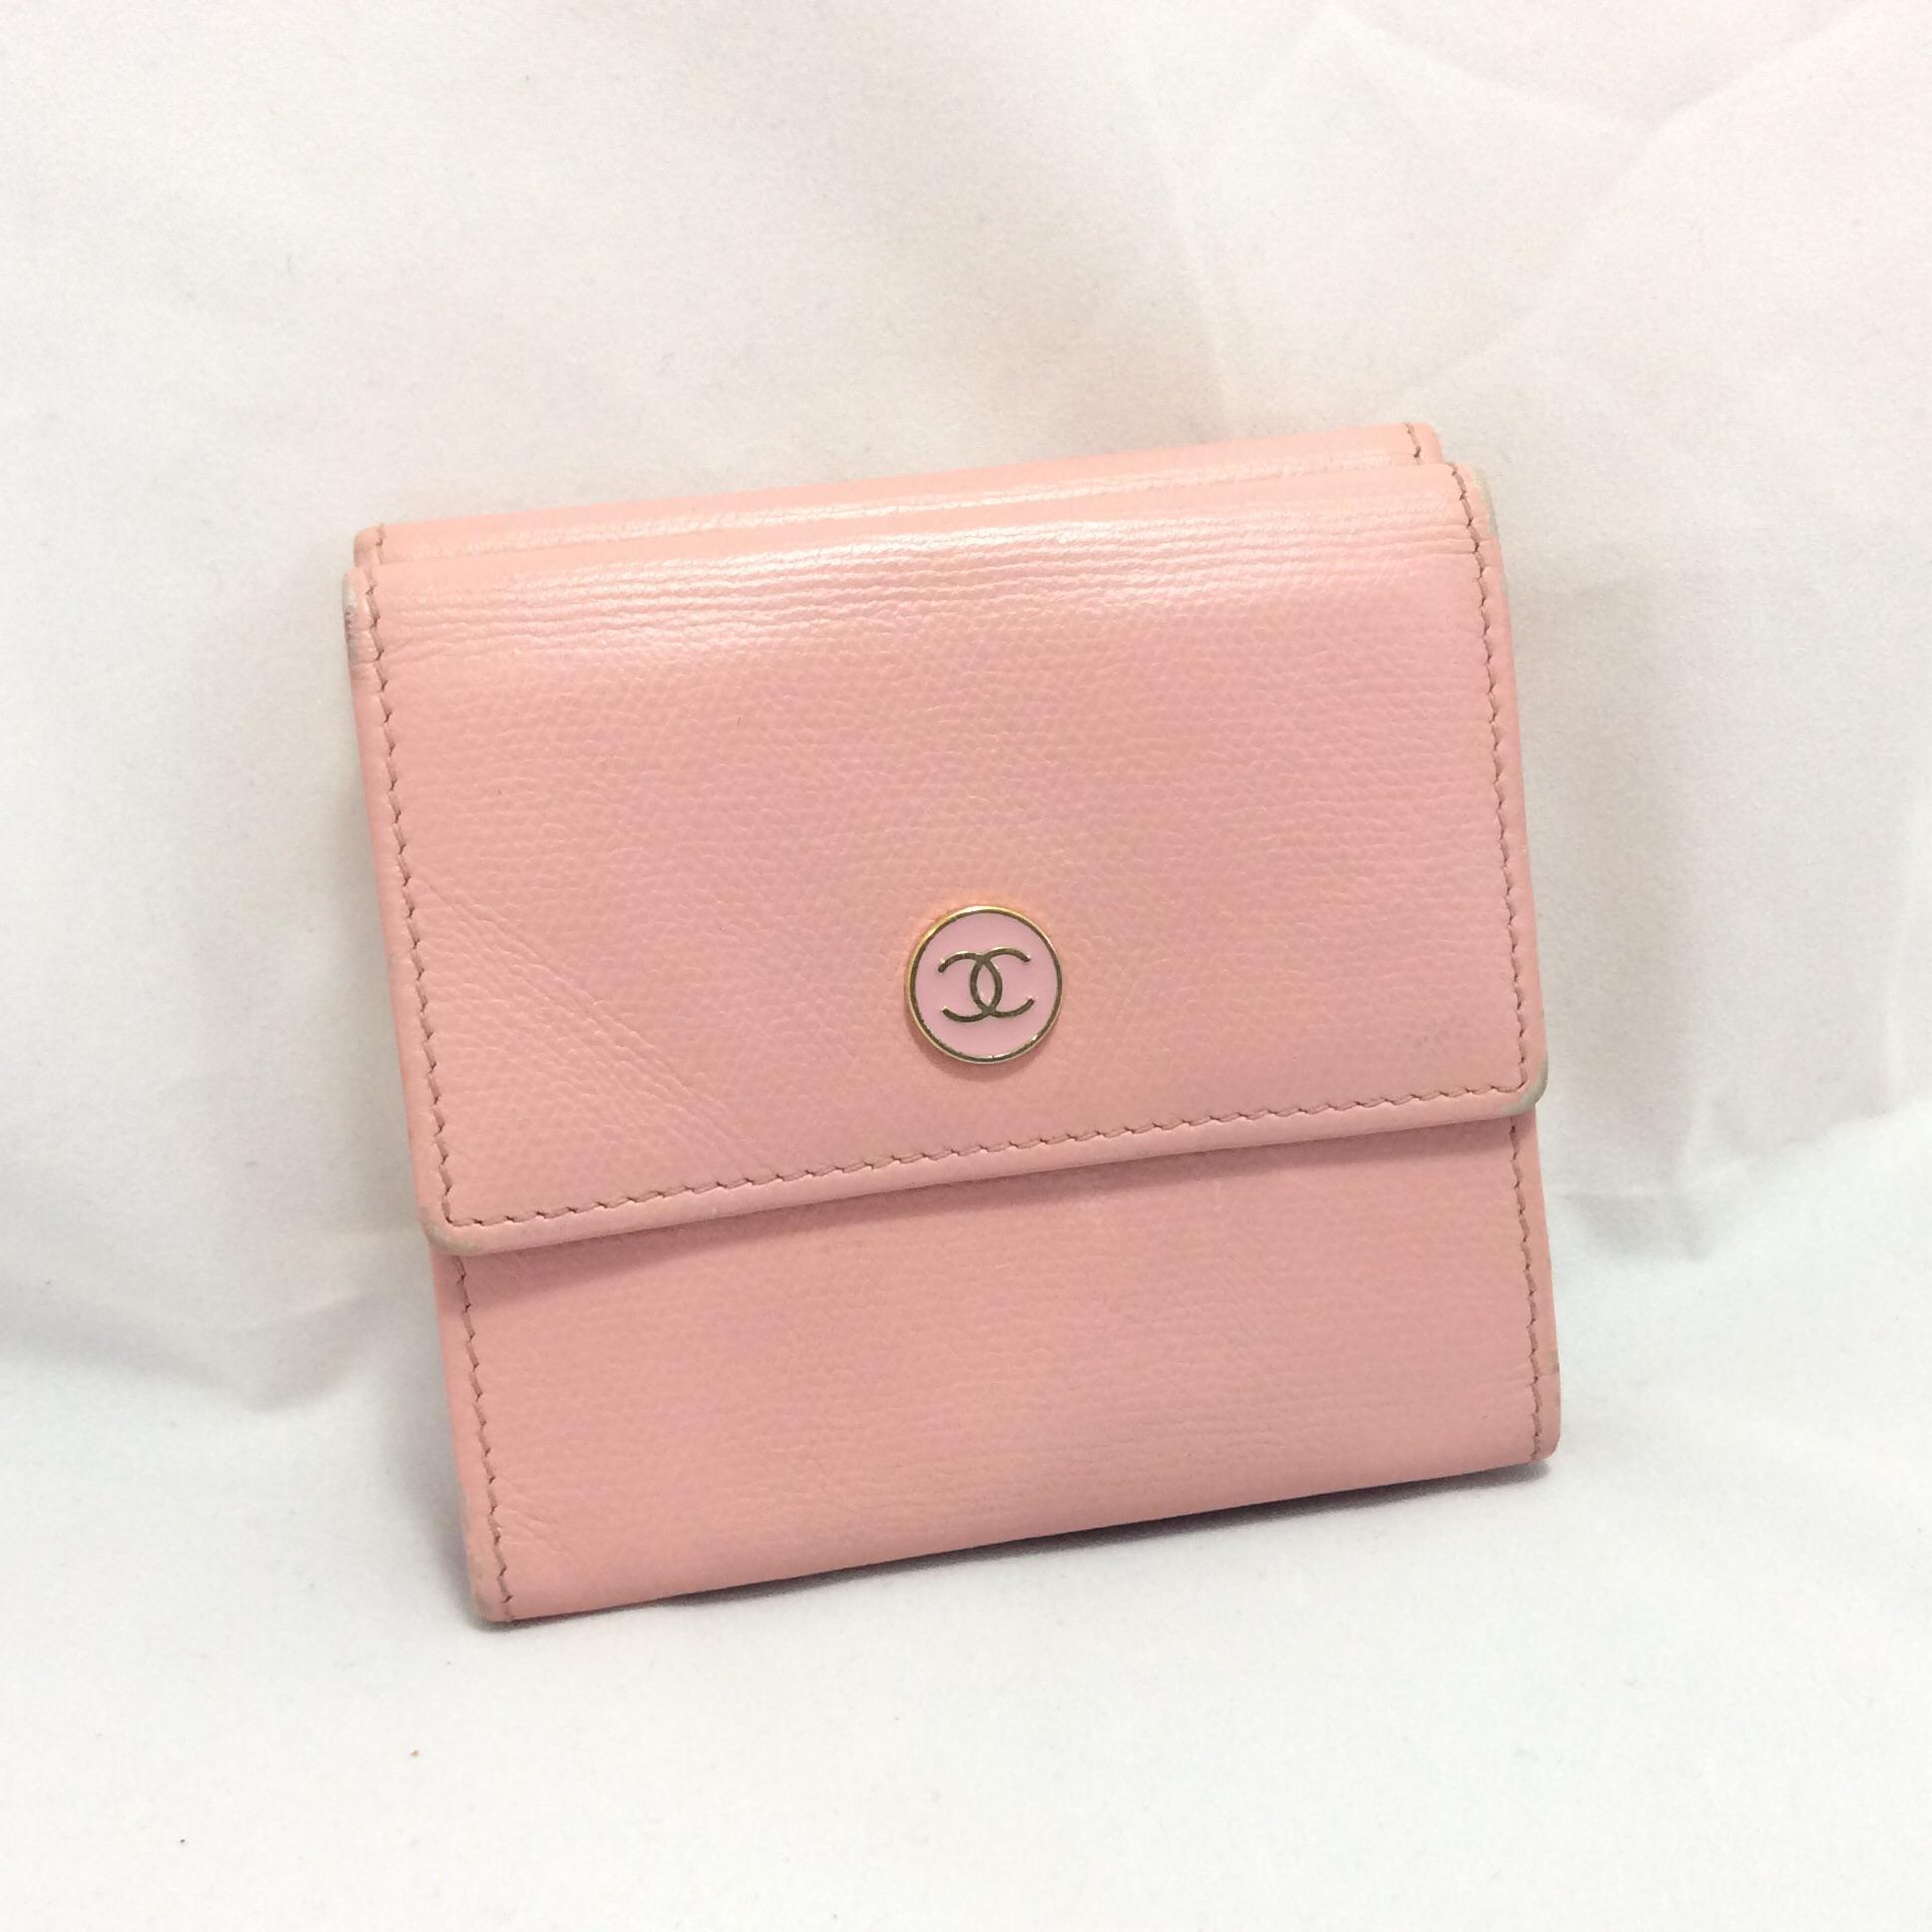 [SOLDOUT]กระเป๋าสตางค์ Chanel ใบสั้น 3 พับ รุ่นวินเทจ สีชมพูหวาน(Holo 9912399)